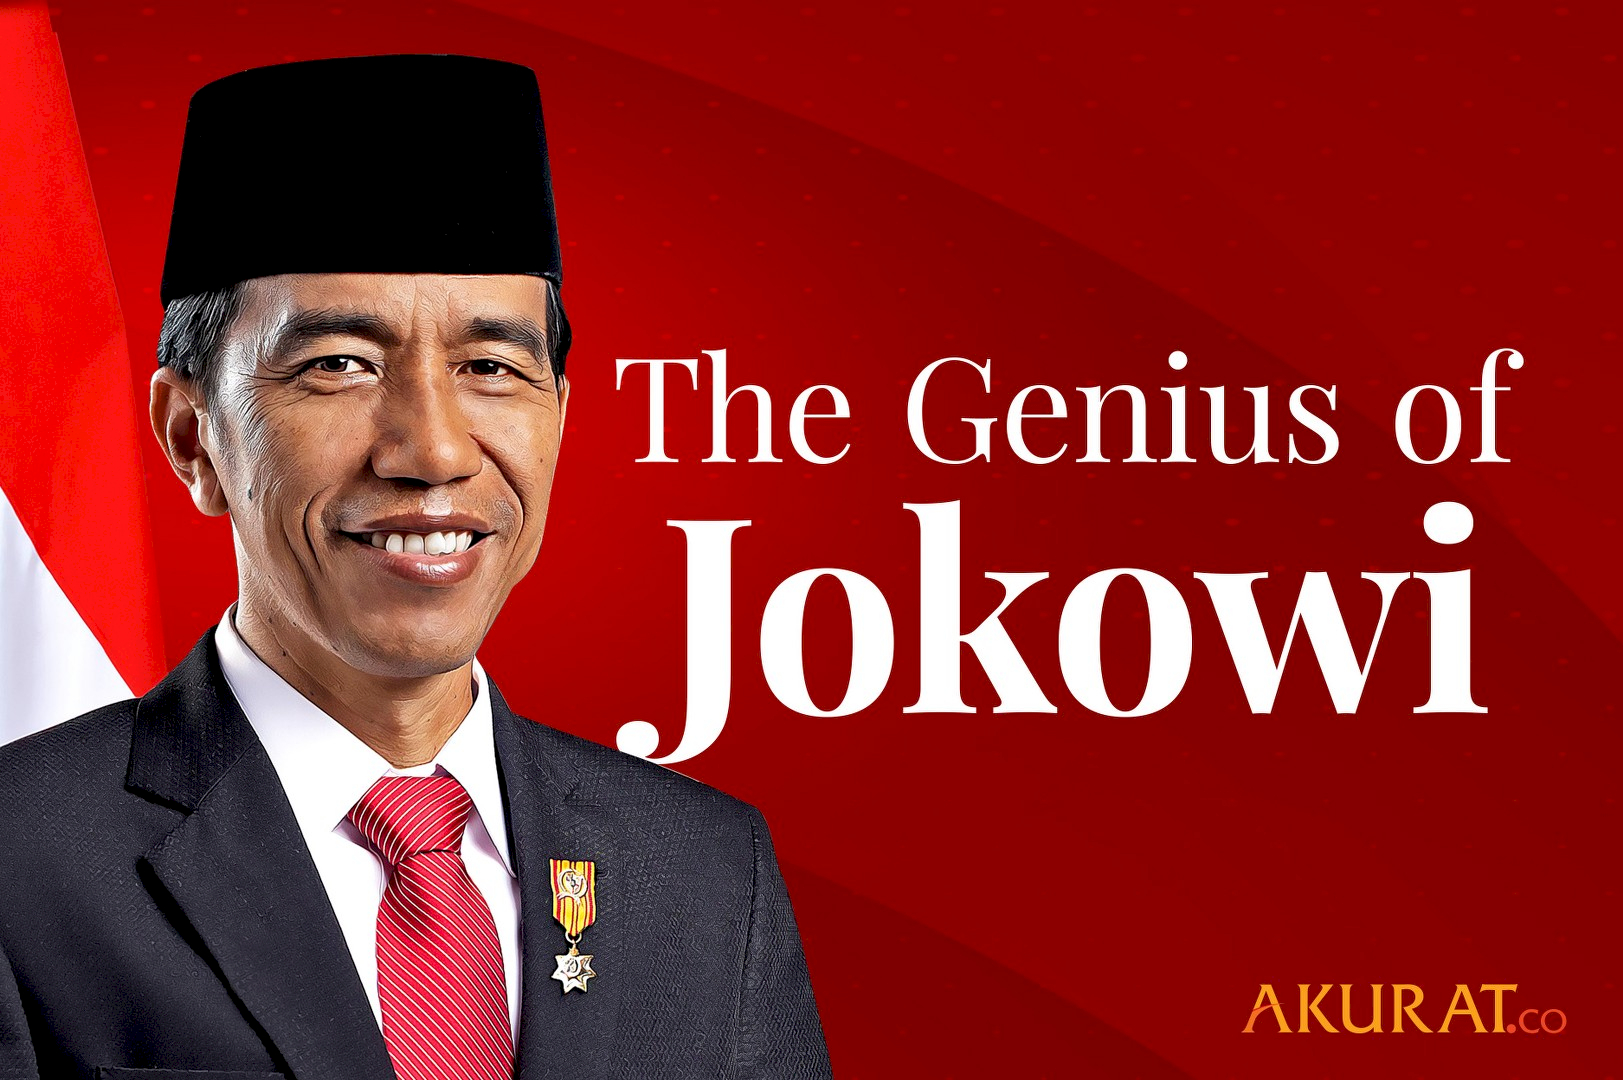 The Genius of Jokowi